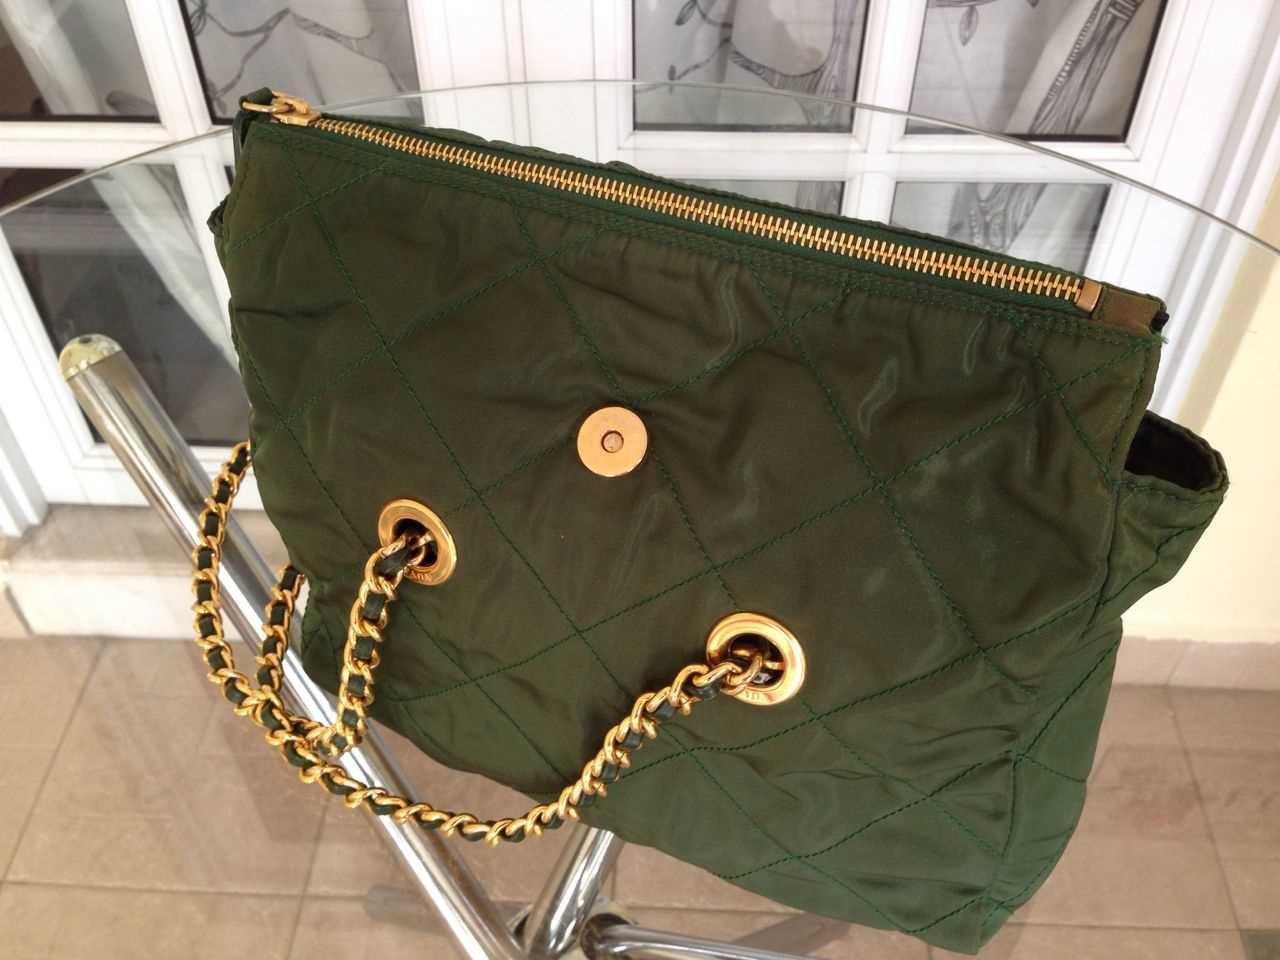 c4318dda29 Truly Vintage  Authentic Prada Quilted Green Nylon Chain Bag